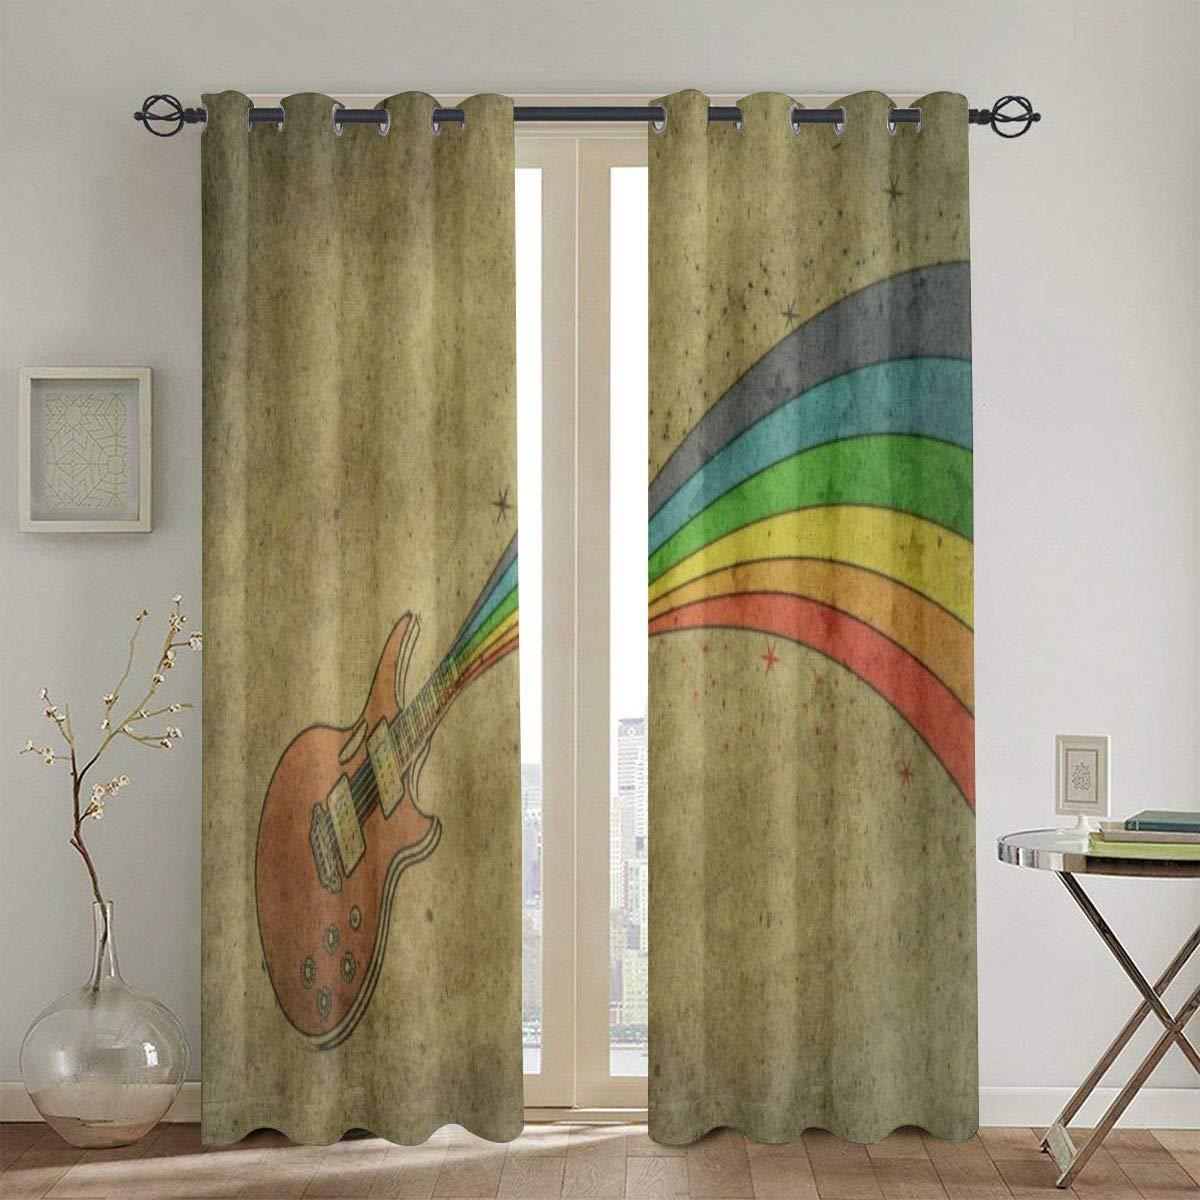 XicoLtd Guitar Rainbow Window Curtains Window Drapes Blackout Curtains Panels - 2 Panels 52 x 72 in by XicoLtd